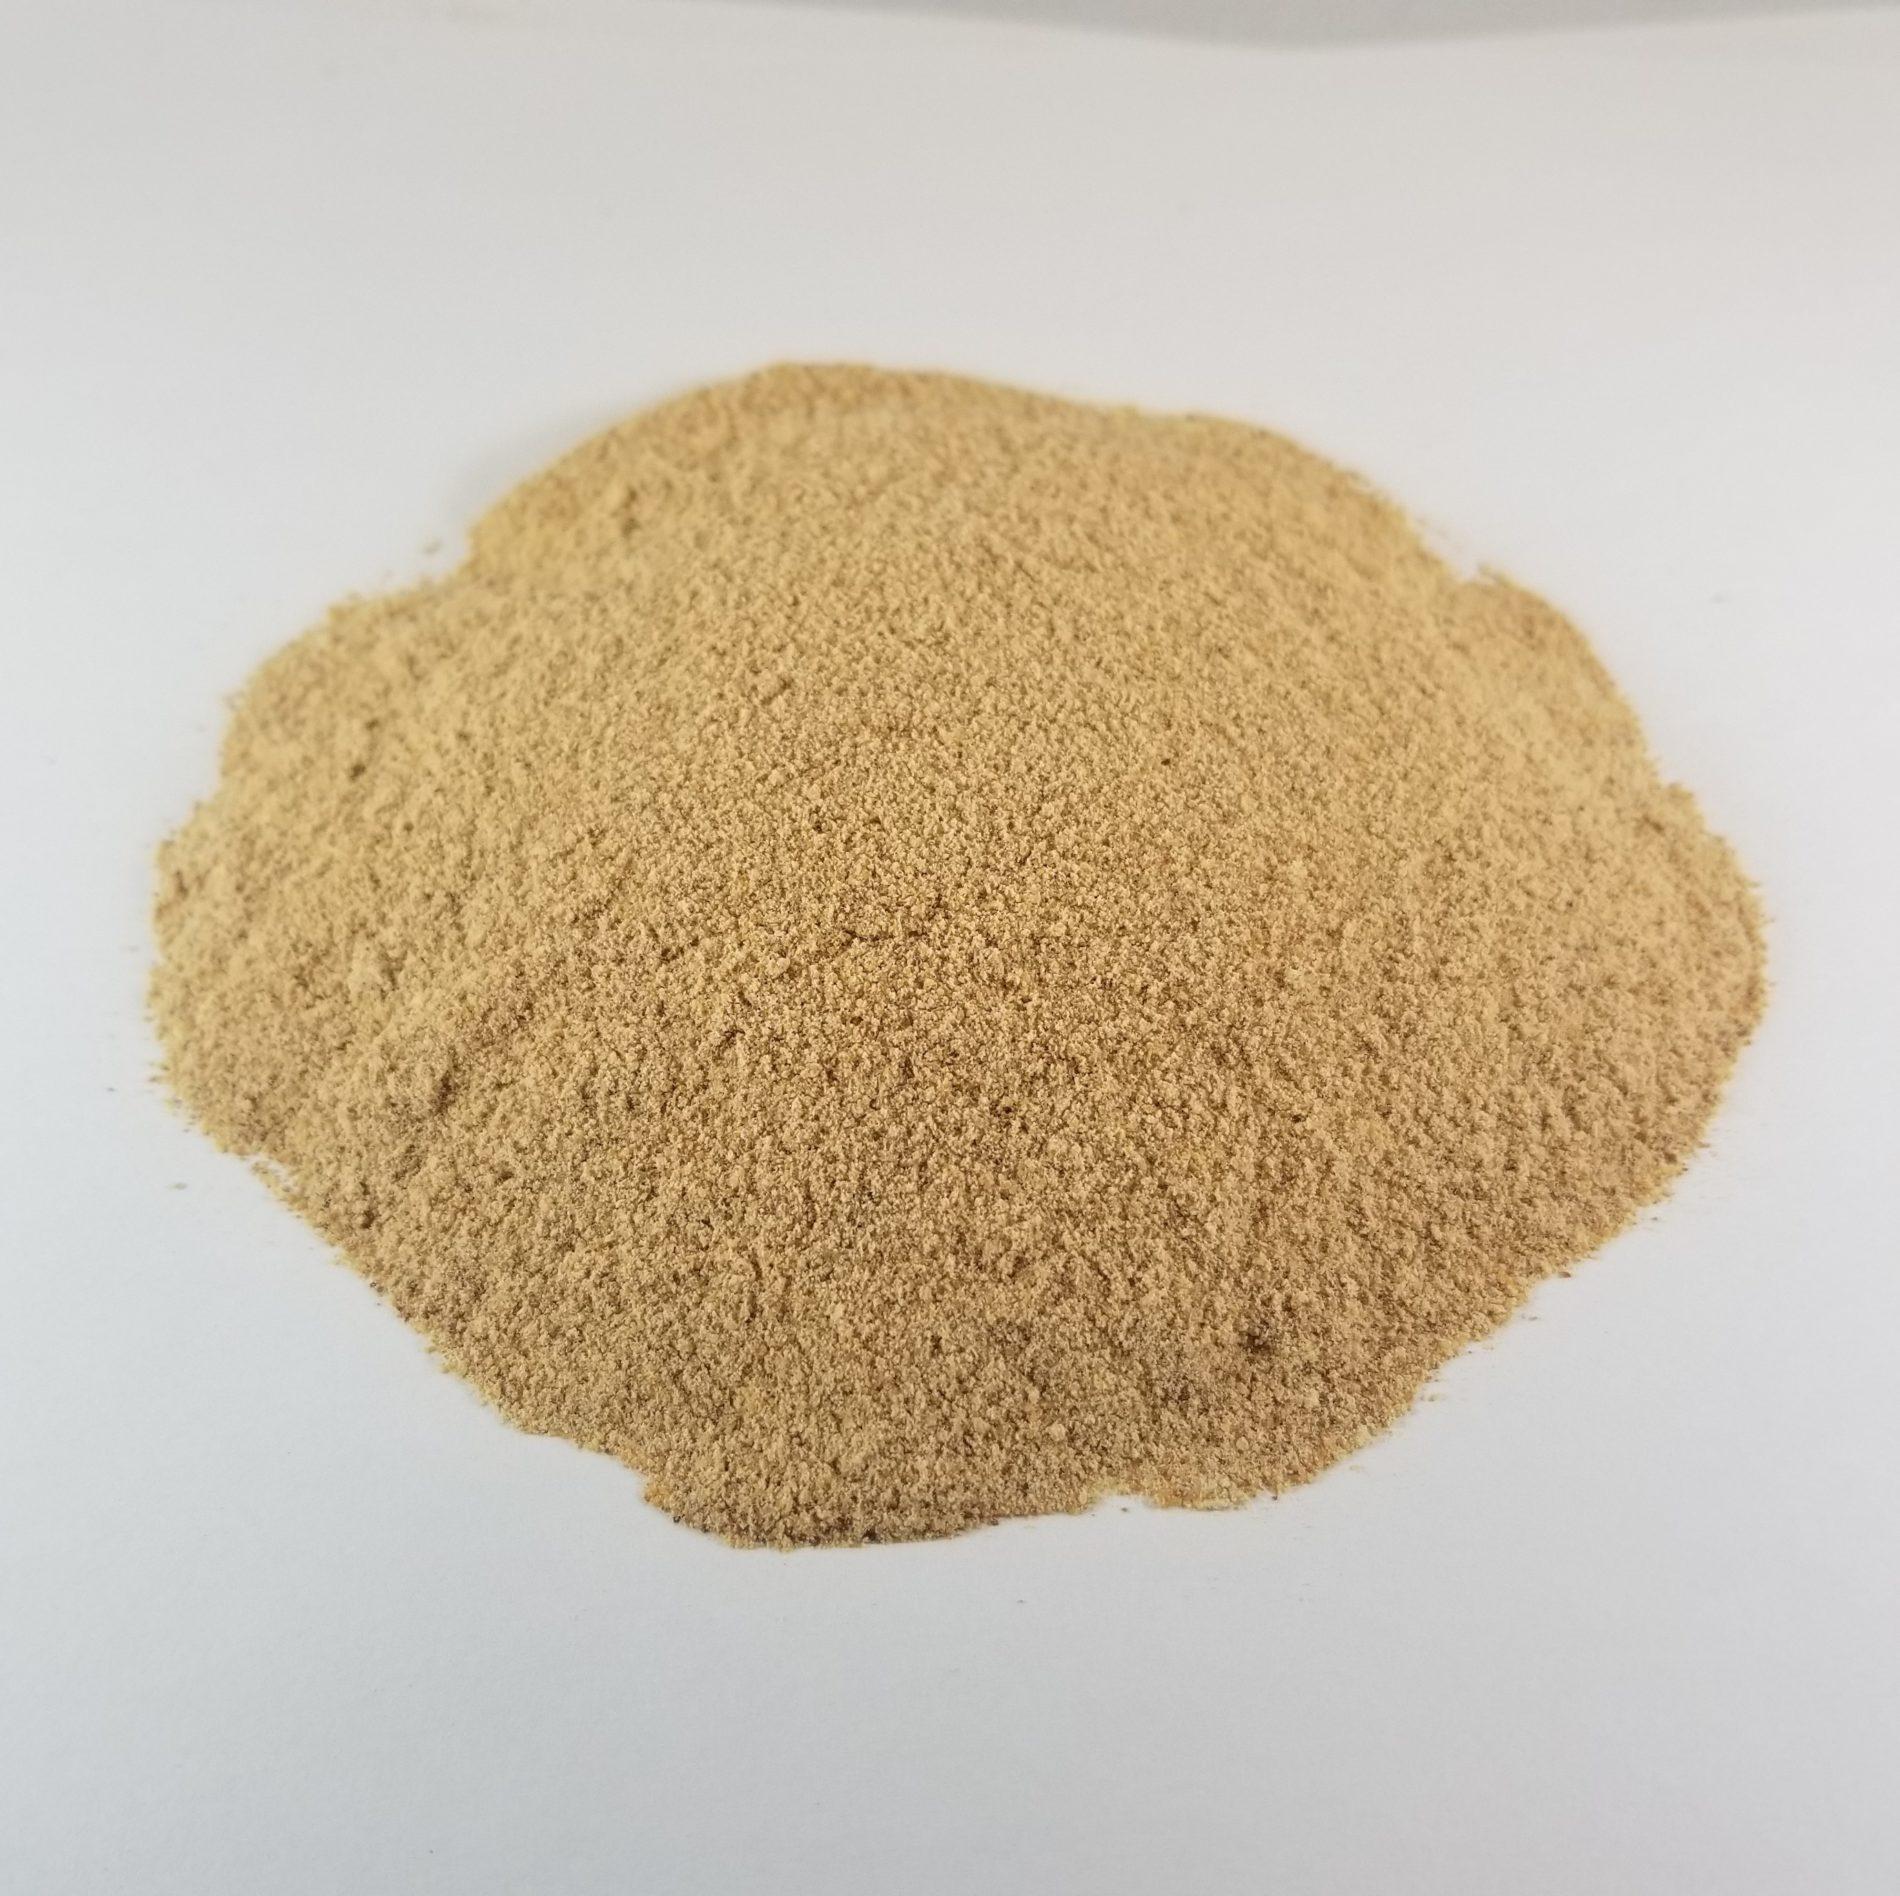 Pinto Bean Powder Low Sodium, 50LB Bag